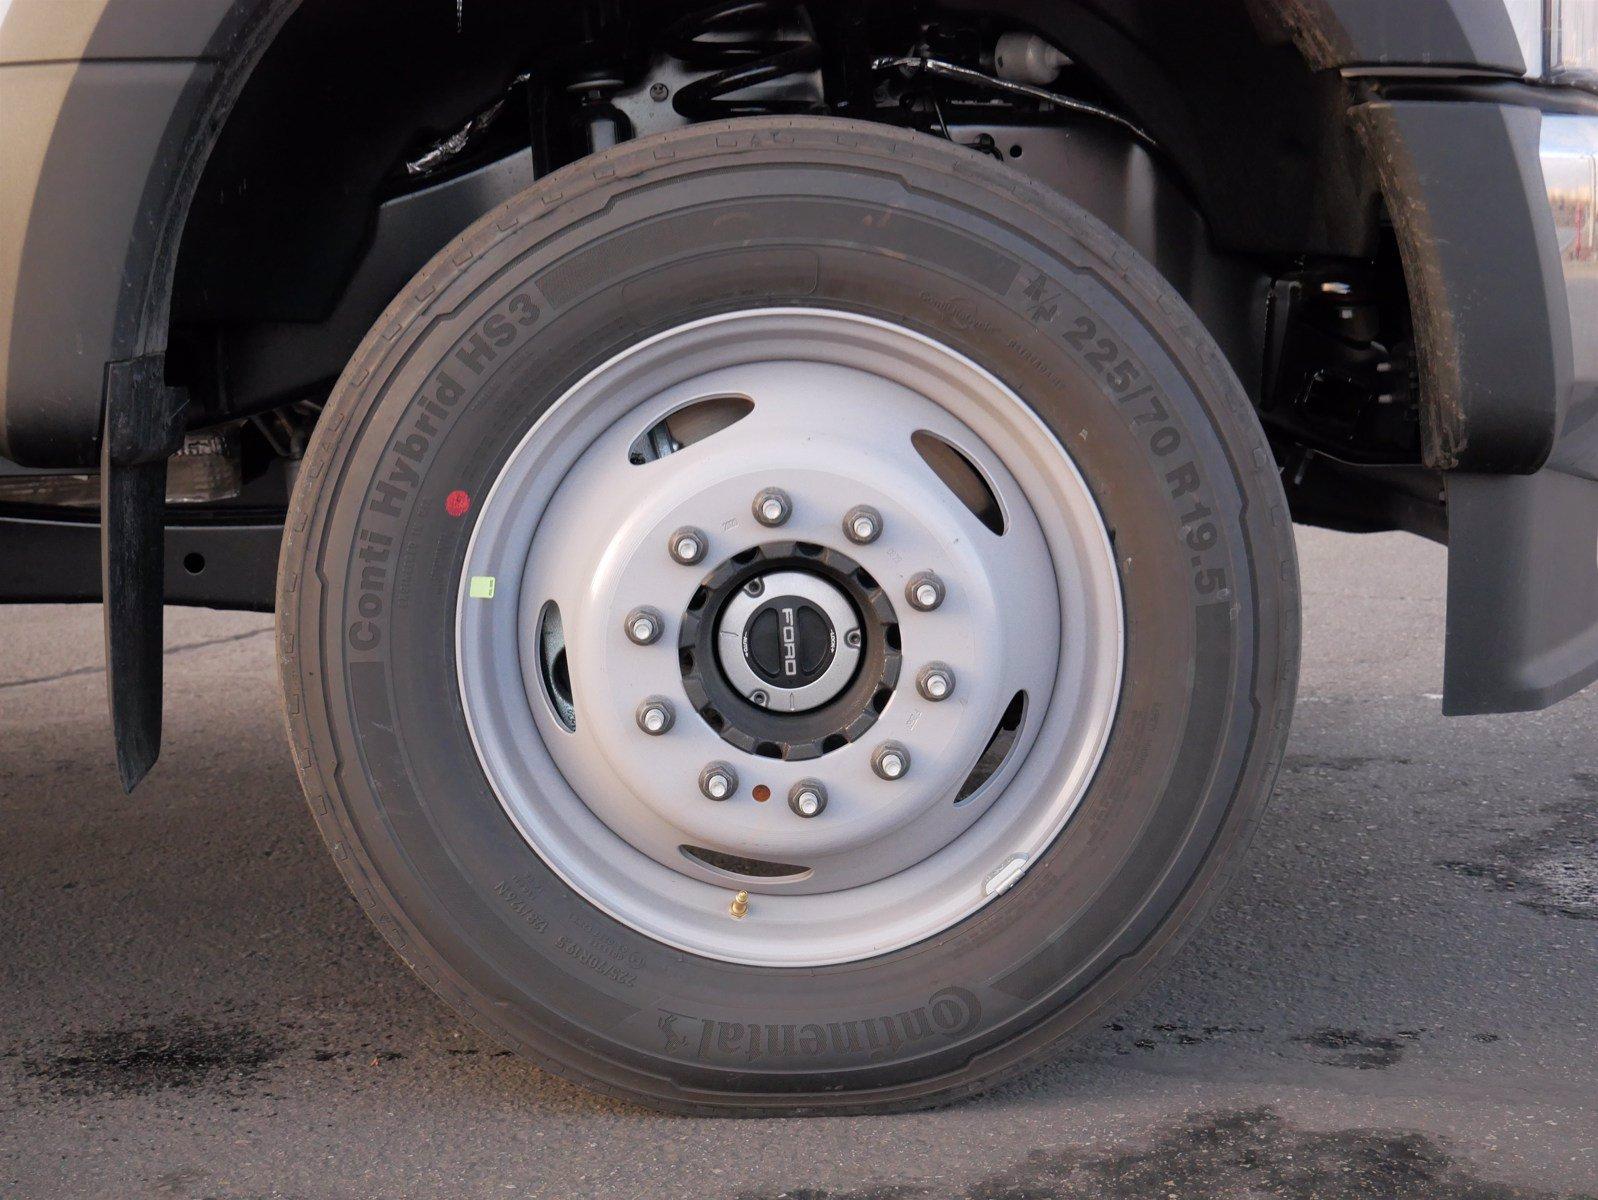 2020 Ford F-550 Regular Cab DRW 4x4, Scelzi Dump Body #63233 - photo 25